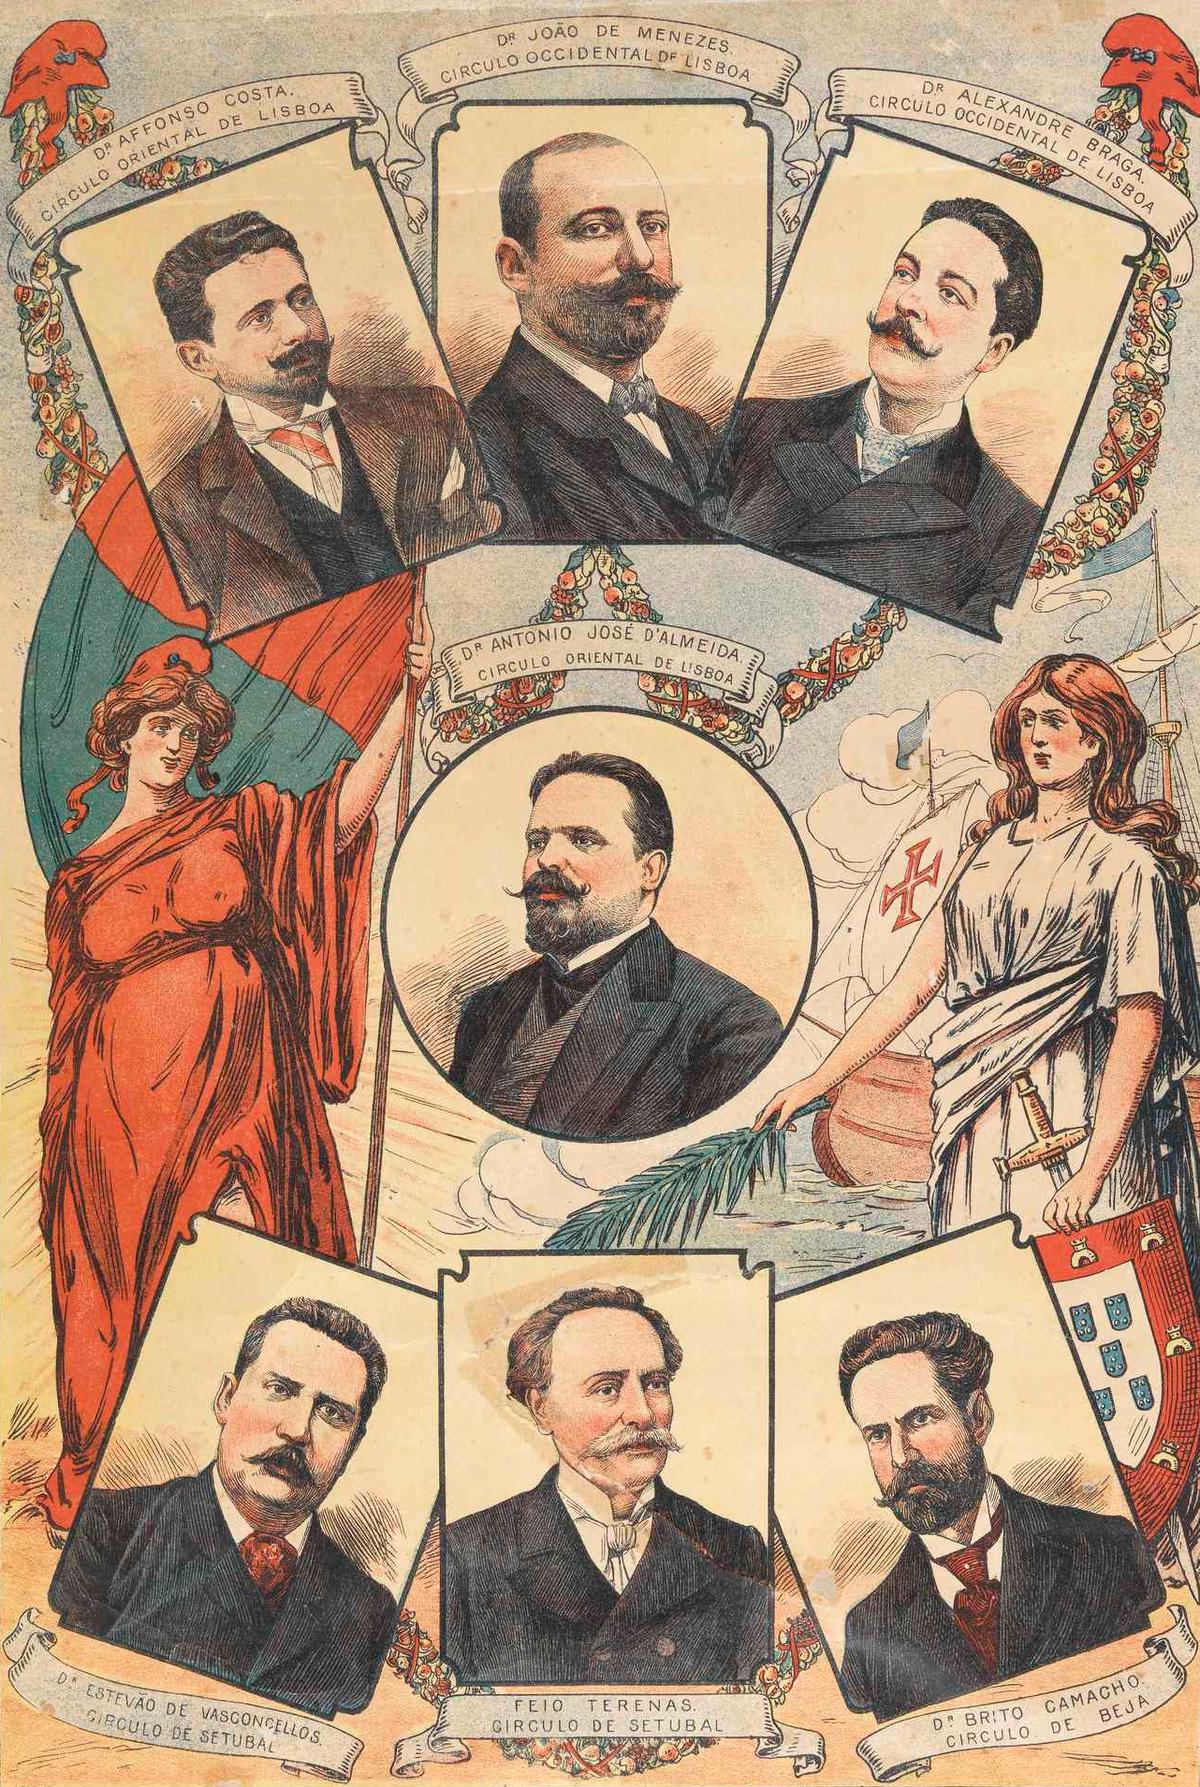 on 5 april 1908